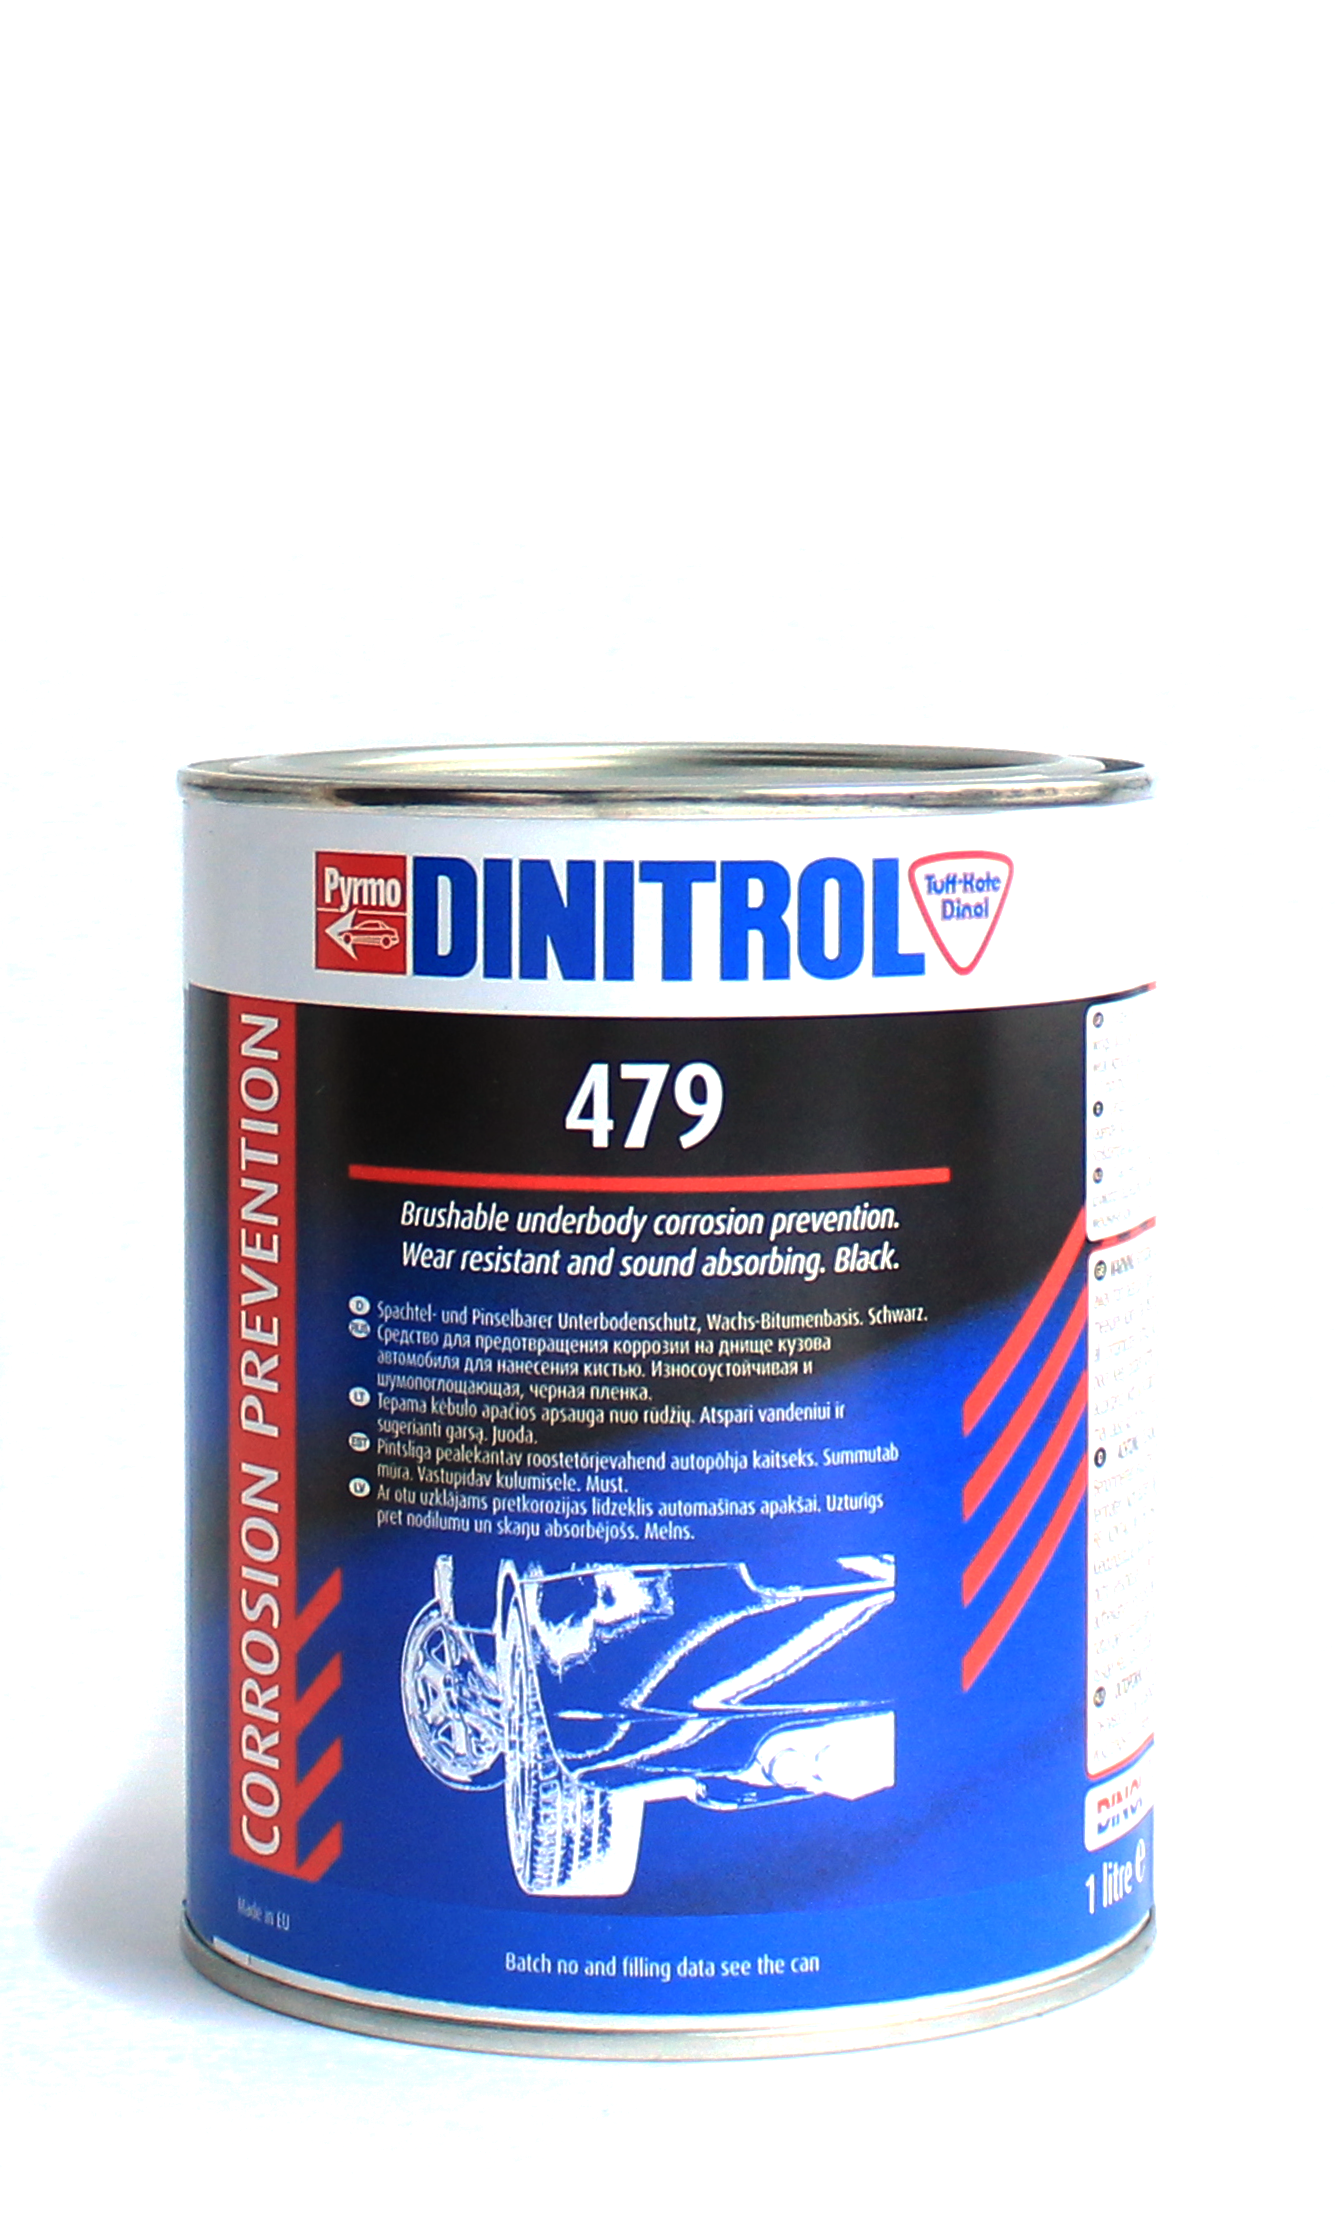 Dinitrol 479, Купить Dinitrol 479, Динитрол 479, антикор Dinitrol 479, жидкие подкрылки динитрол 479